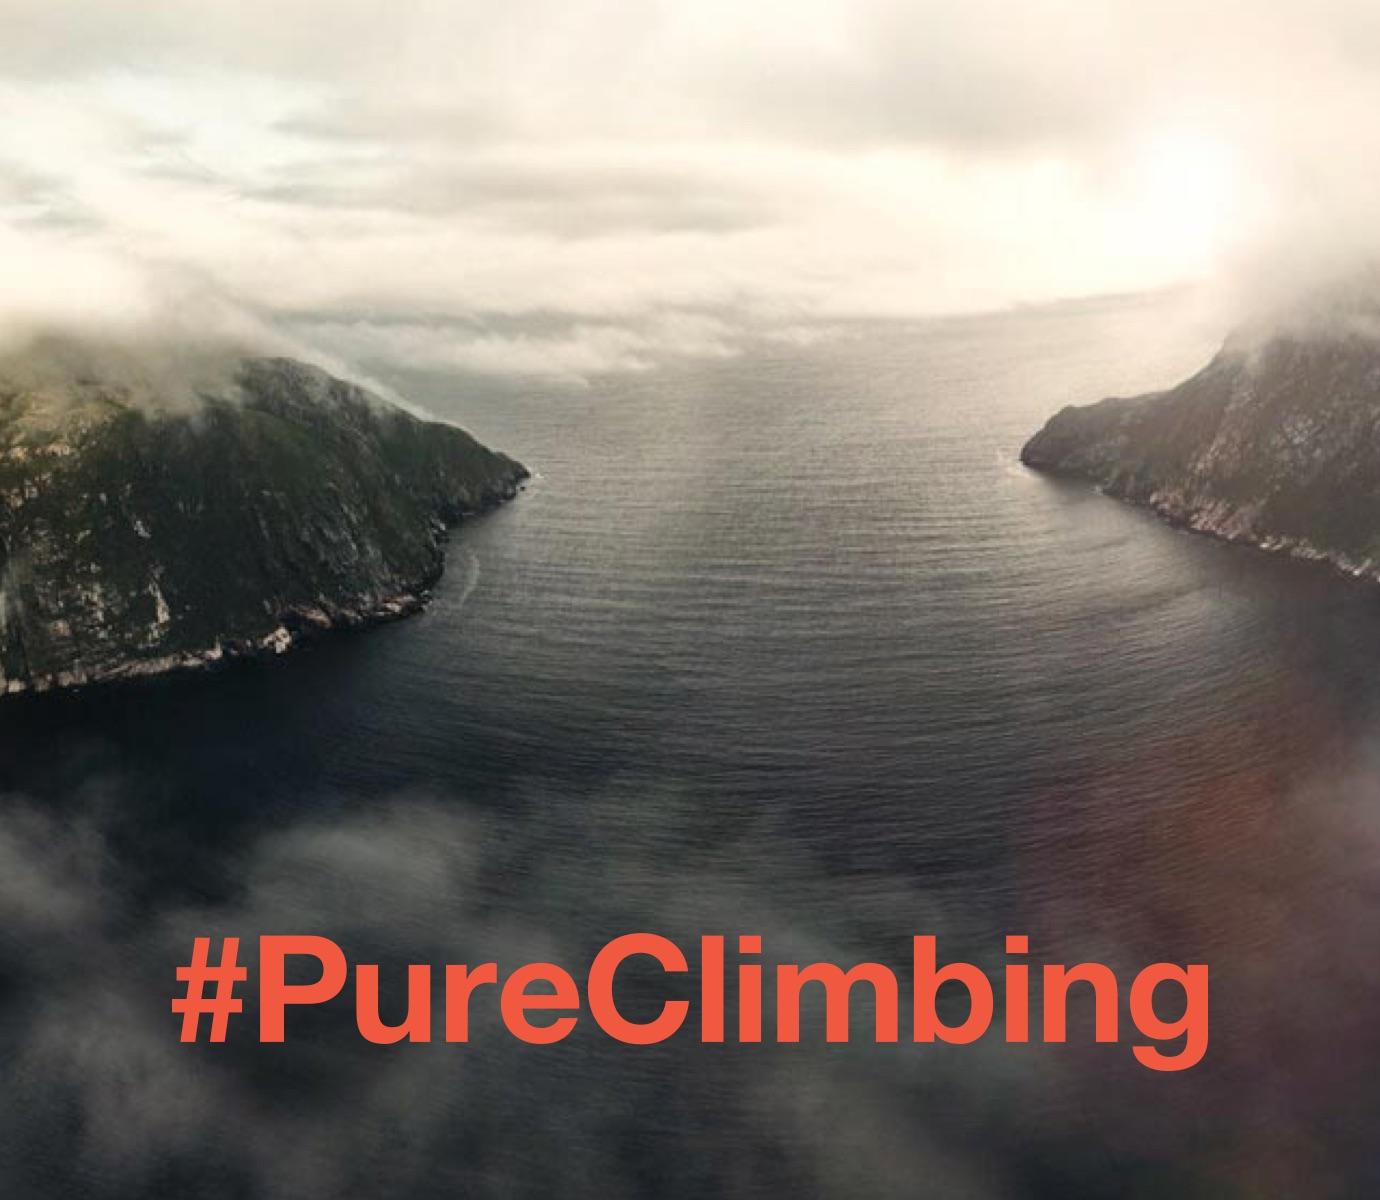 #PureClimbing hashtag overlaying a beautiful landscape